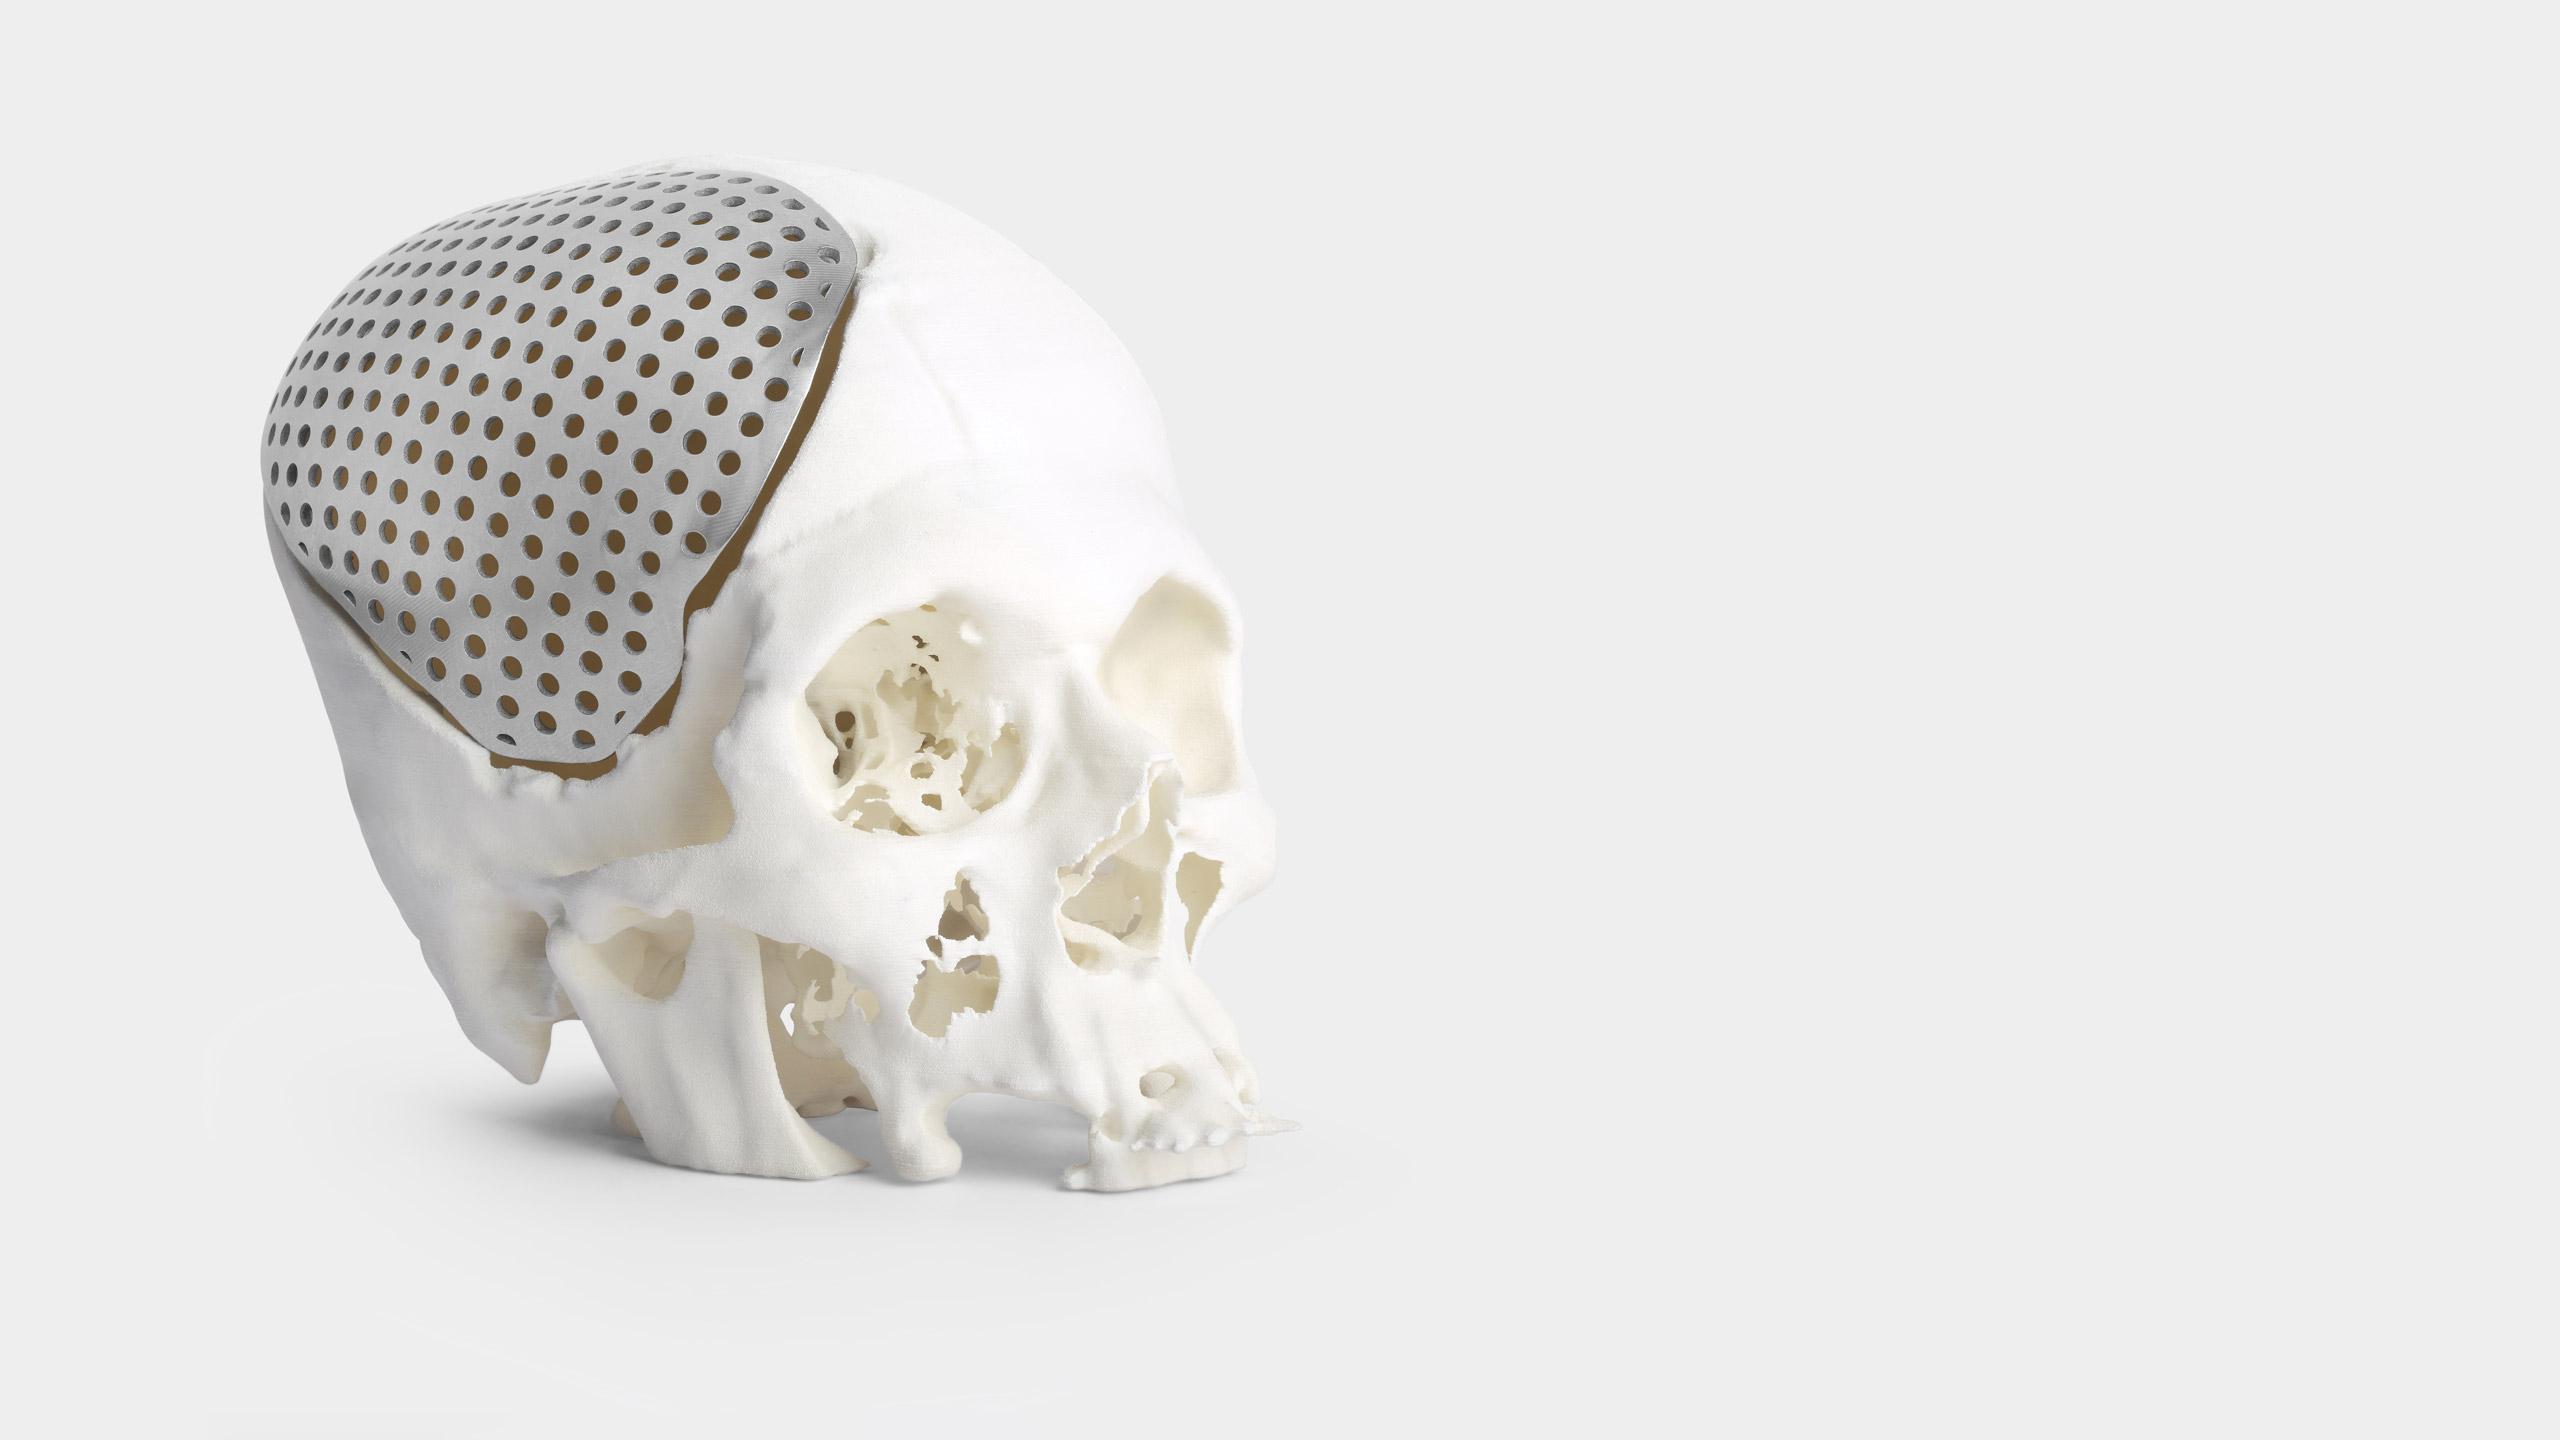 3D printed cranial implant skull